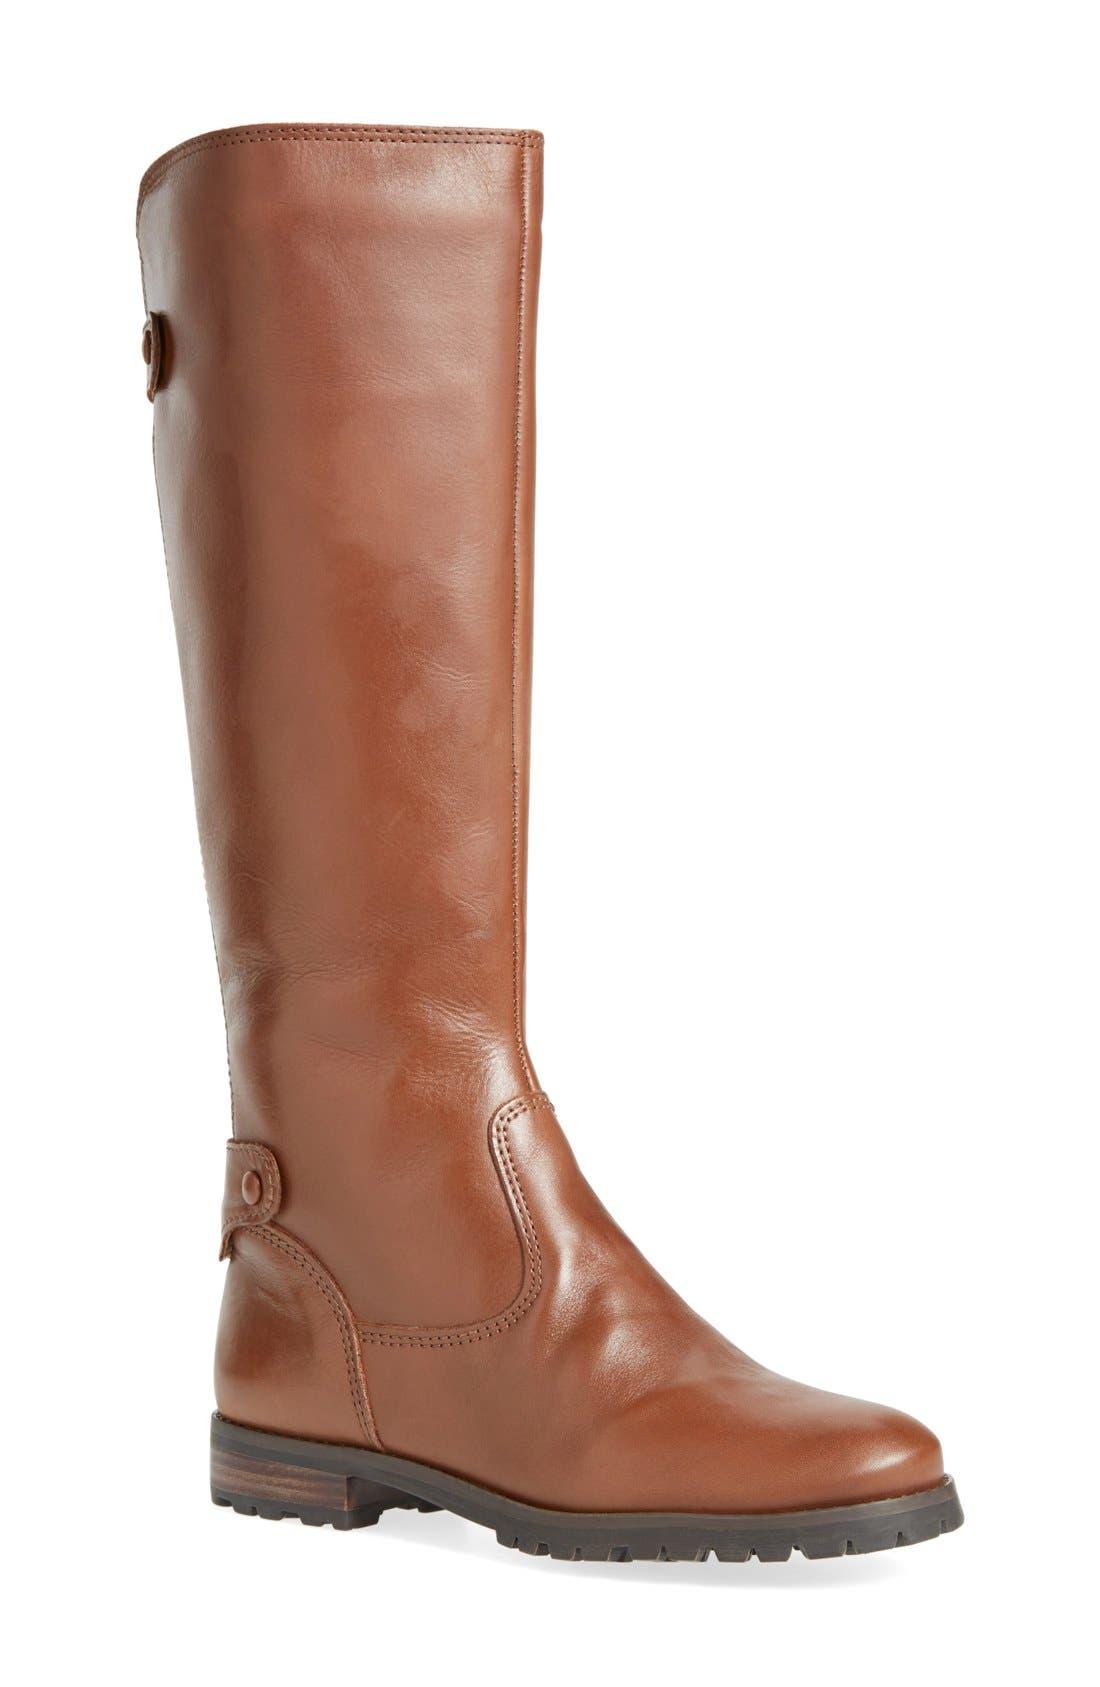 Main Image - CorsoComo 'Wallace' Tall Boot (Women)